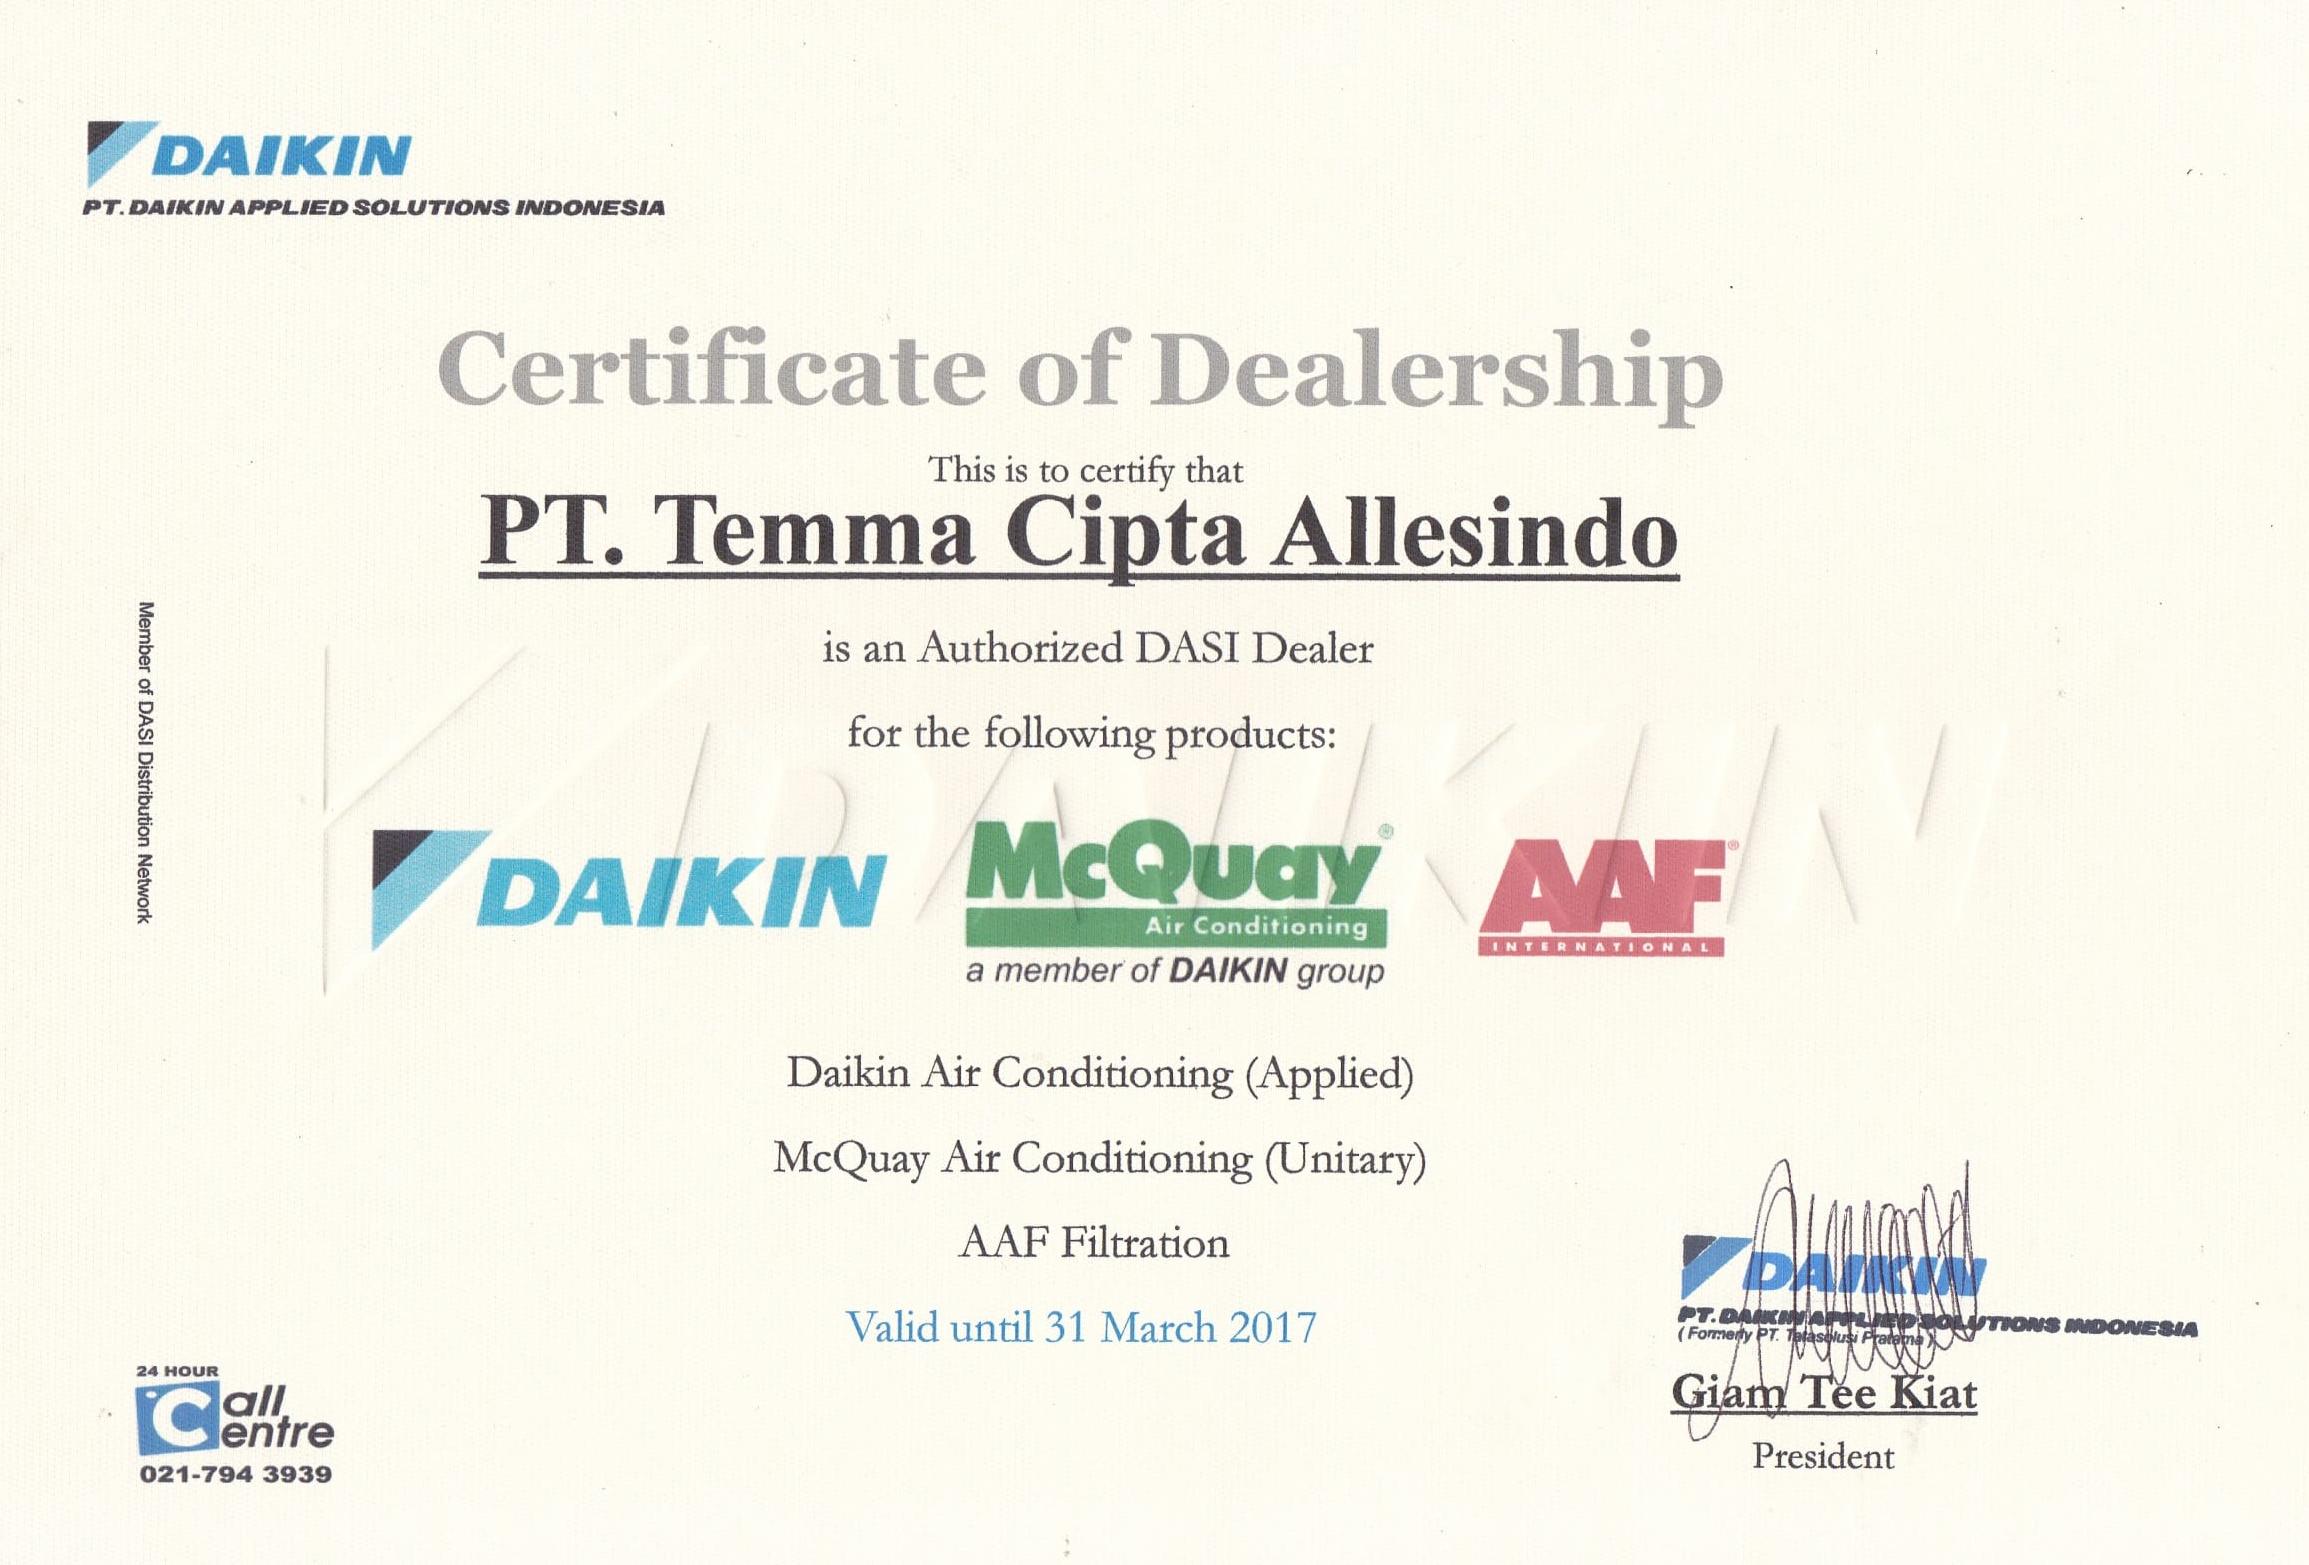 sertifikat-dealership-pt-temma